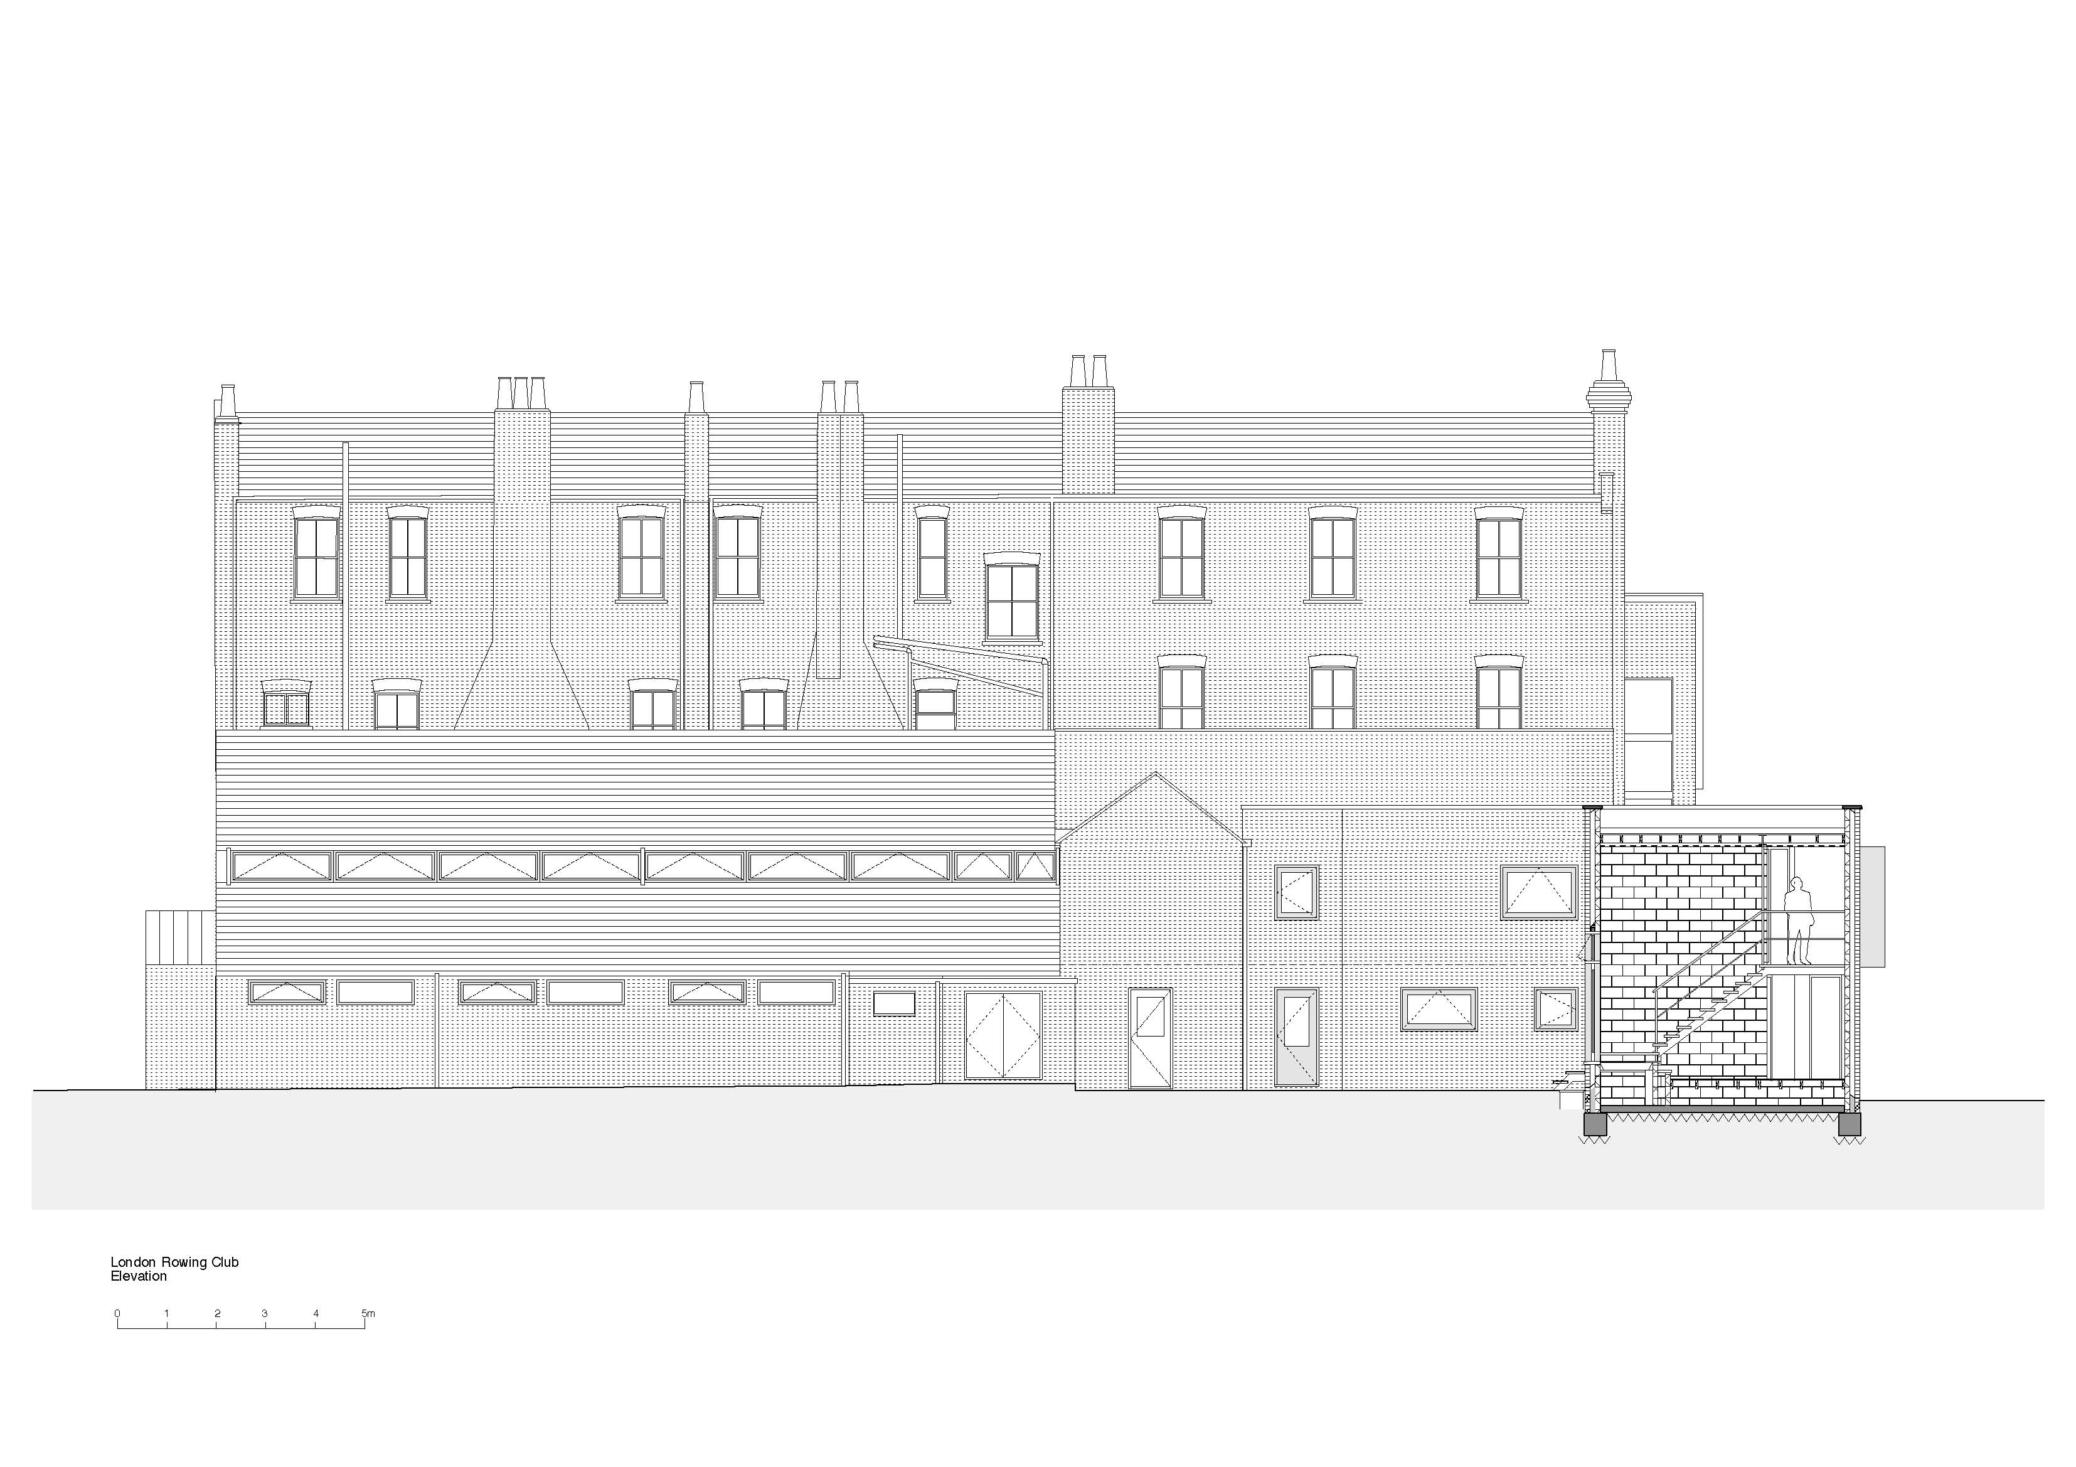 London Rowing Club elevation